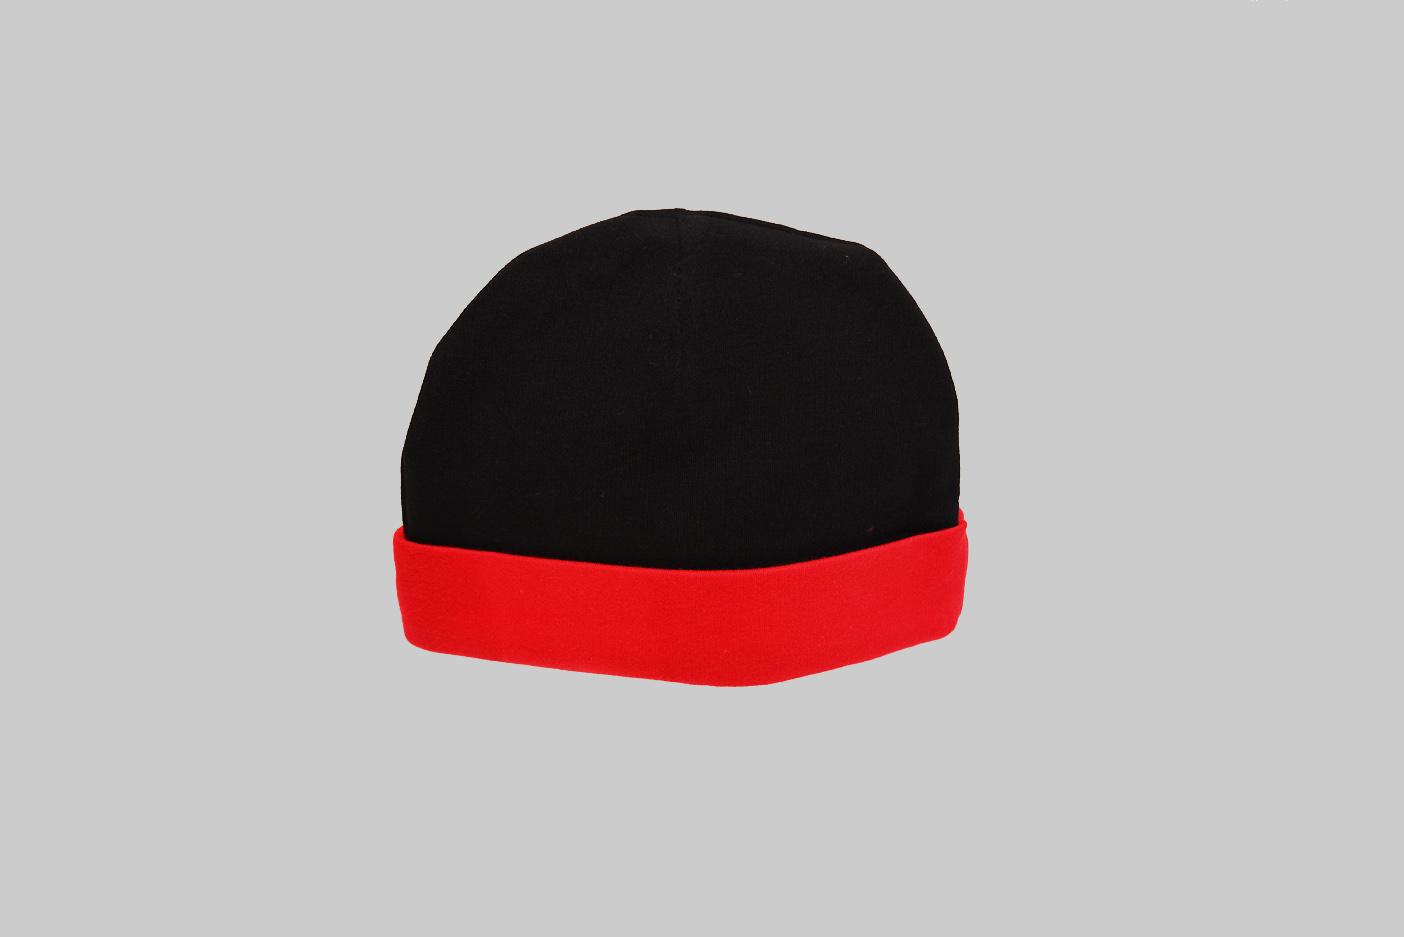 red & black baby cap